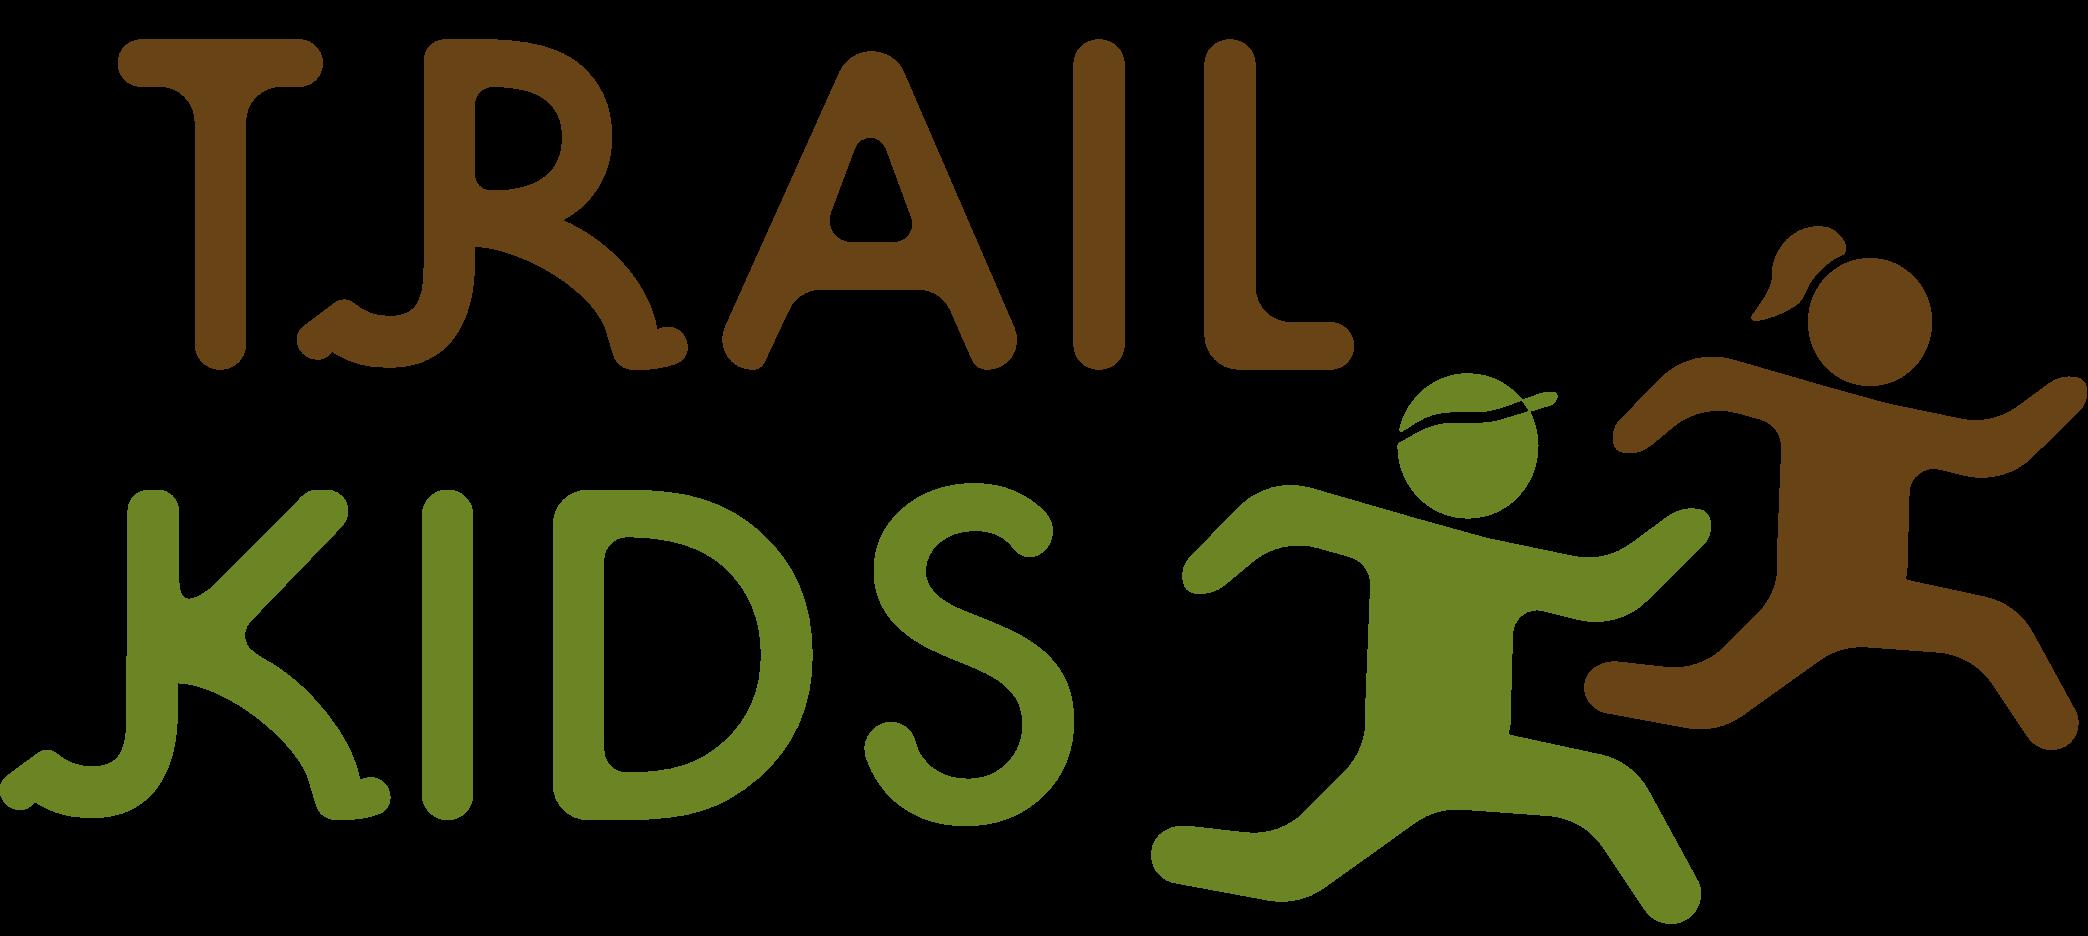 Trail Kids Program